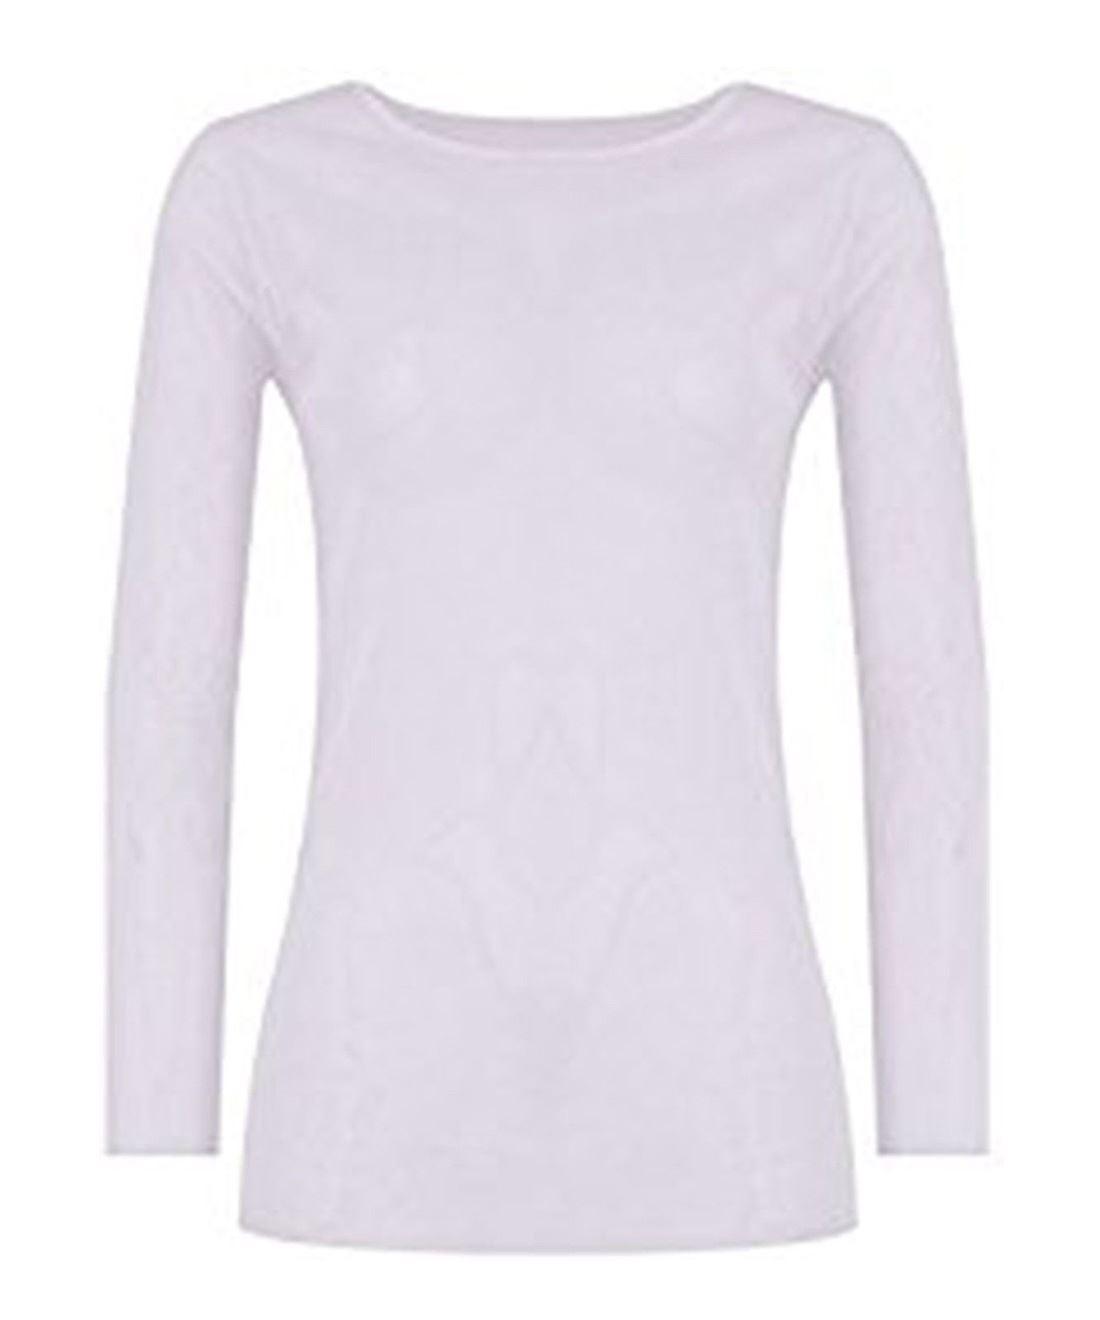 Femme à manches longues Sheer Mesh See Through Plain Top T Shirt Taille 8-22